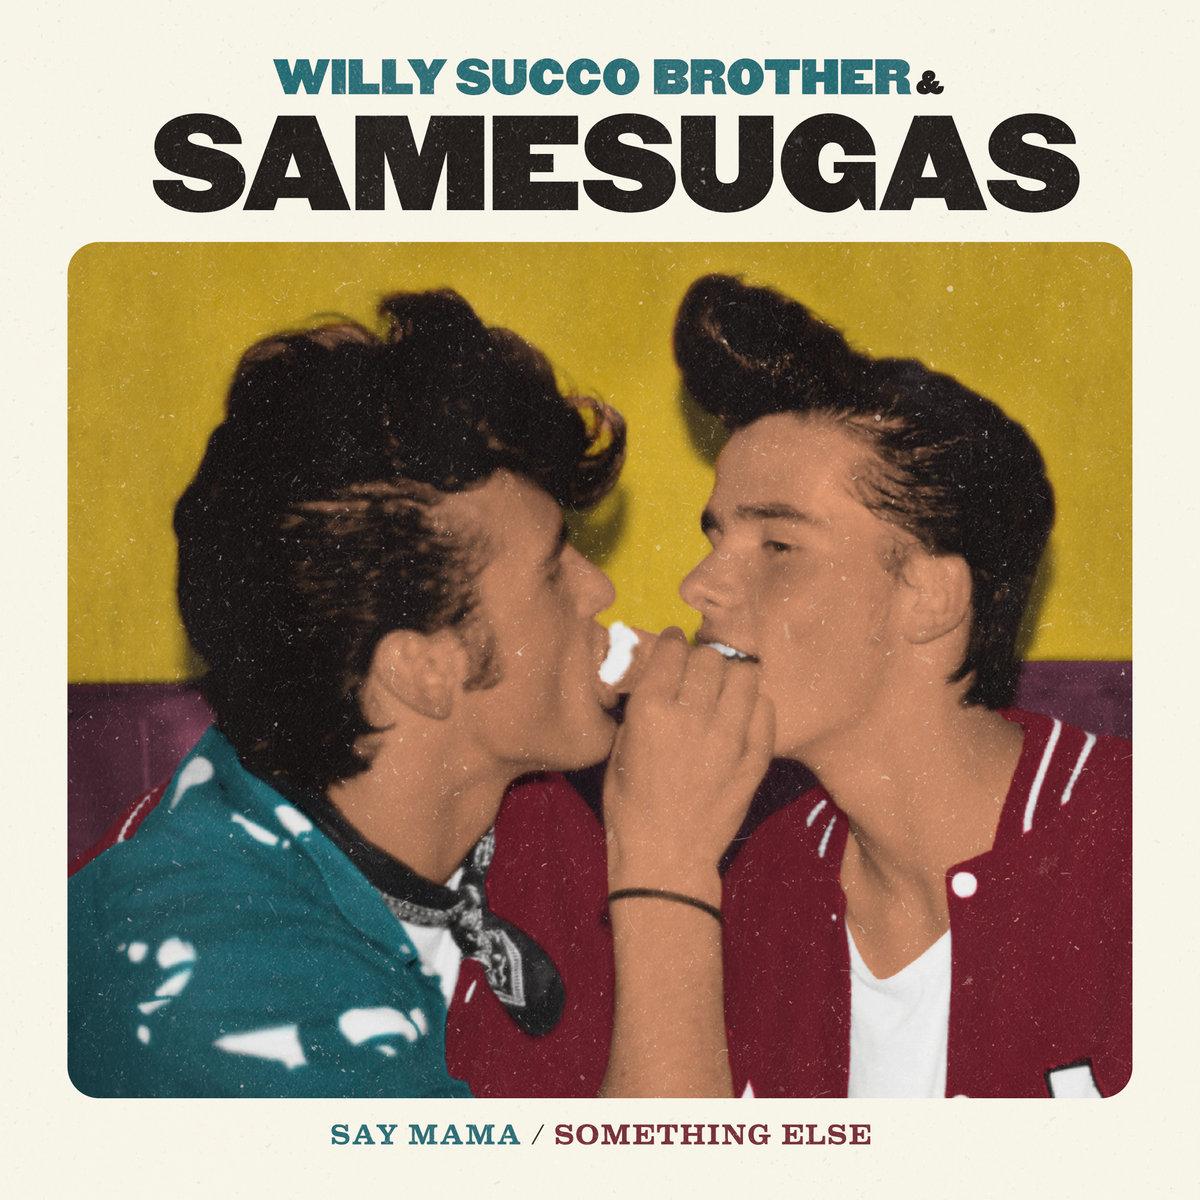 portada del album Willy Succo Brother & Samesugas: Say Mama / Something Else